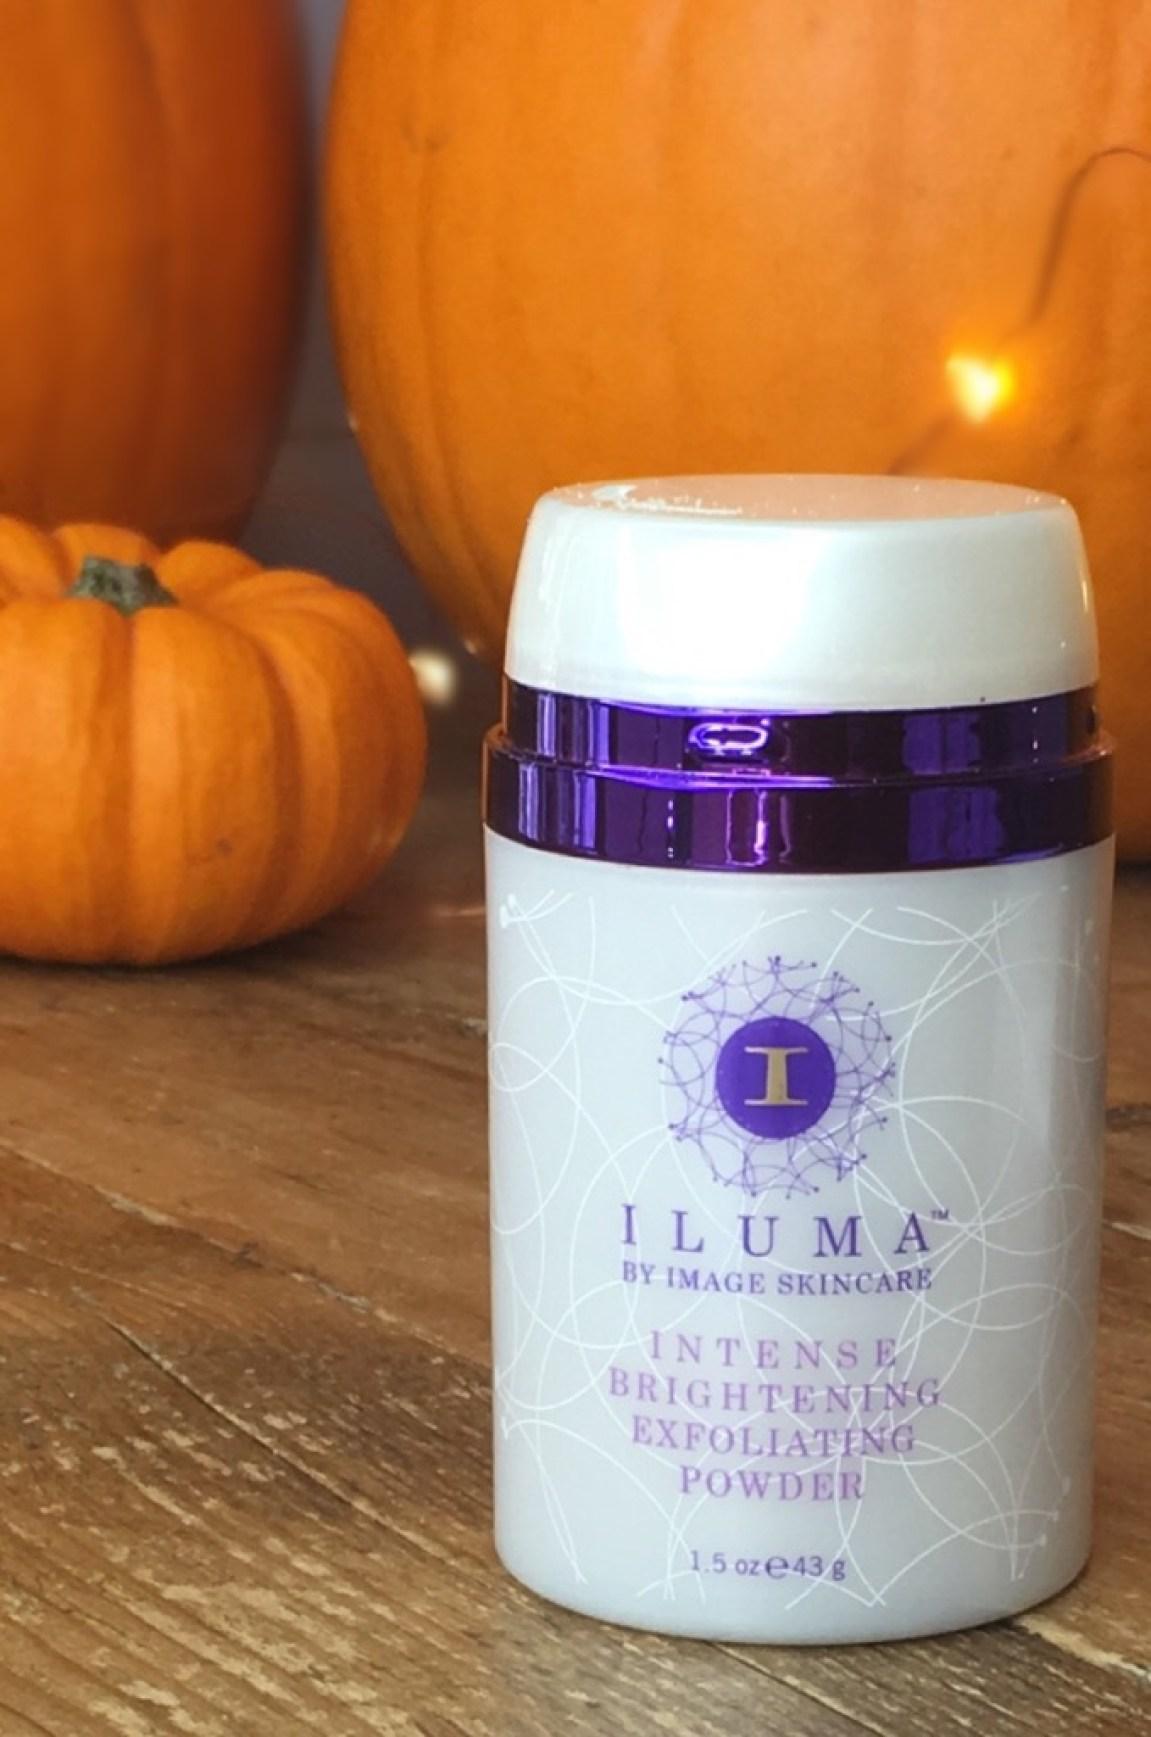 Iluma Intense Brightening Exfoliating Powder The Beauty Spyglass